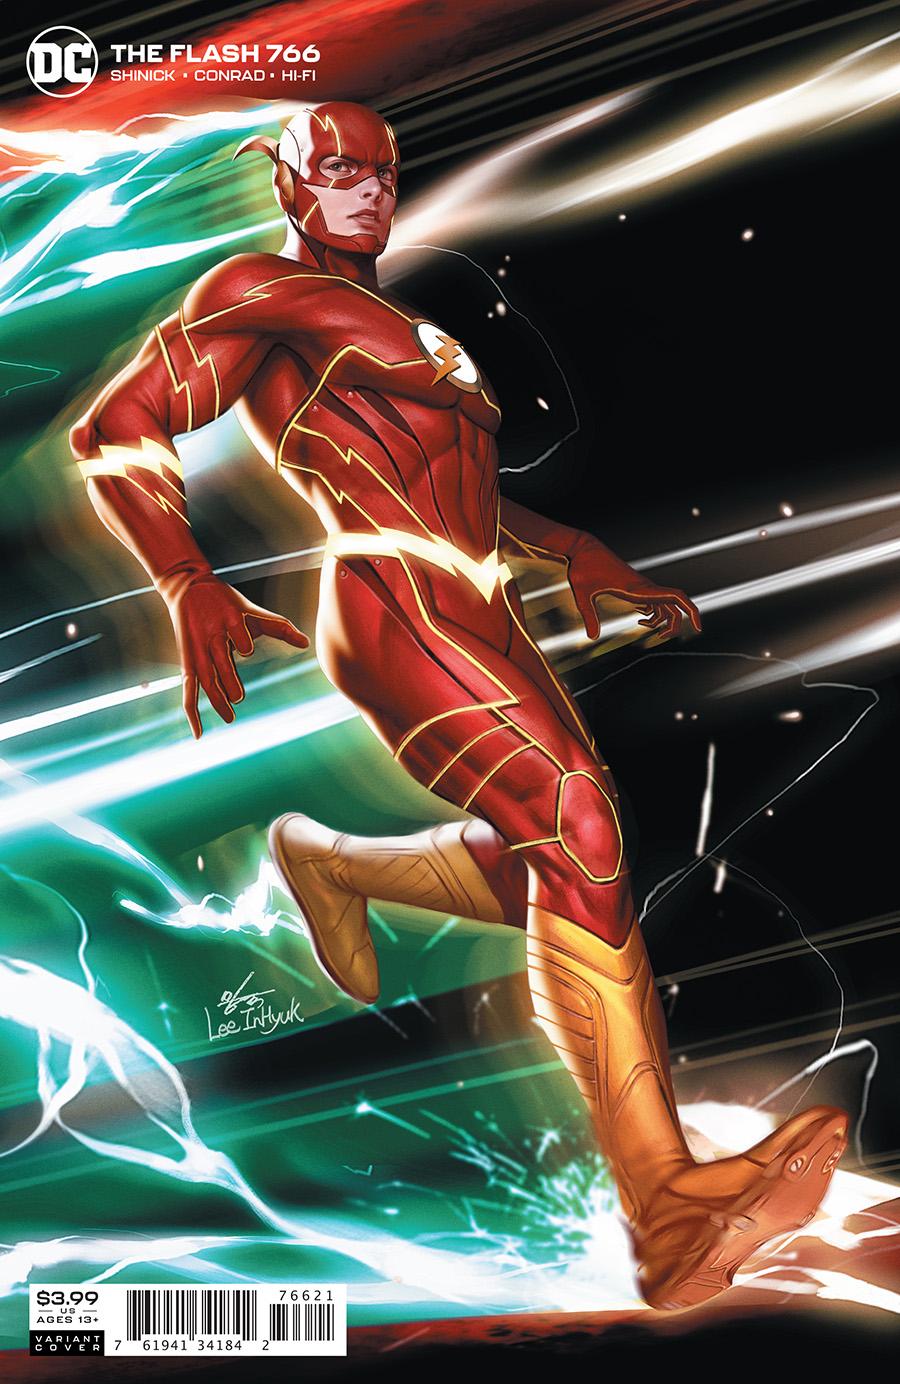 Flash Vol 1 #766 Cover B Inhyuk Lee Variant